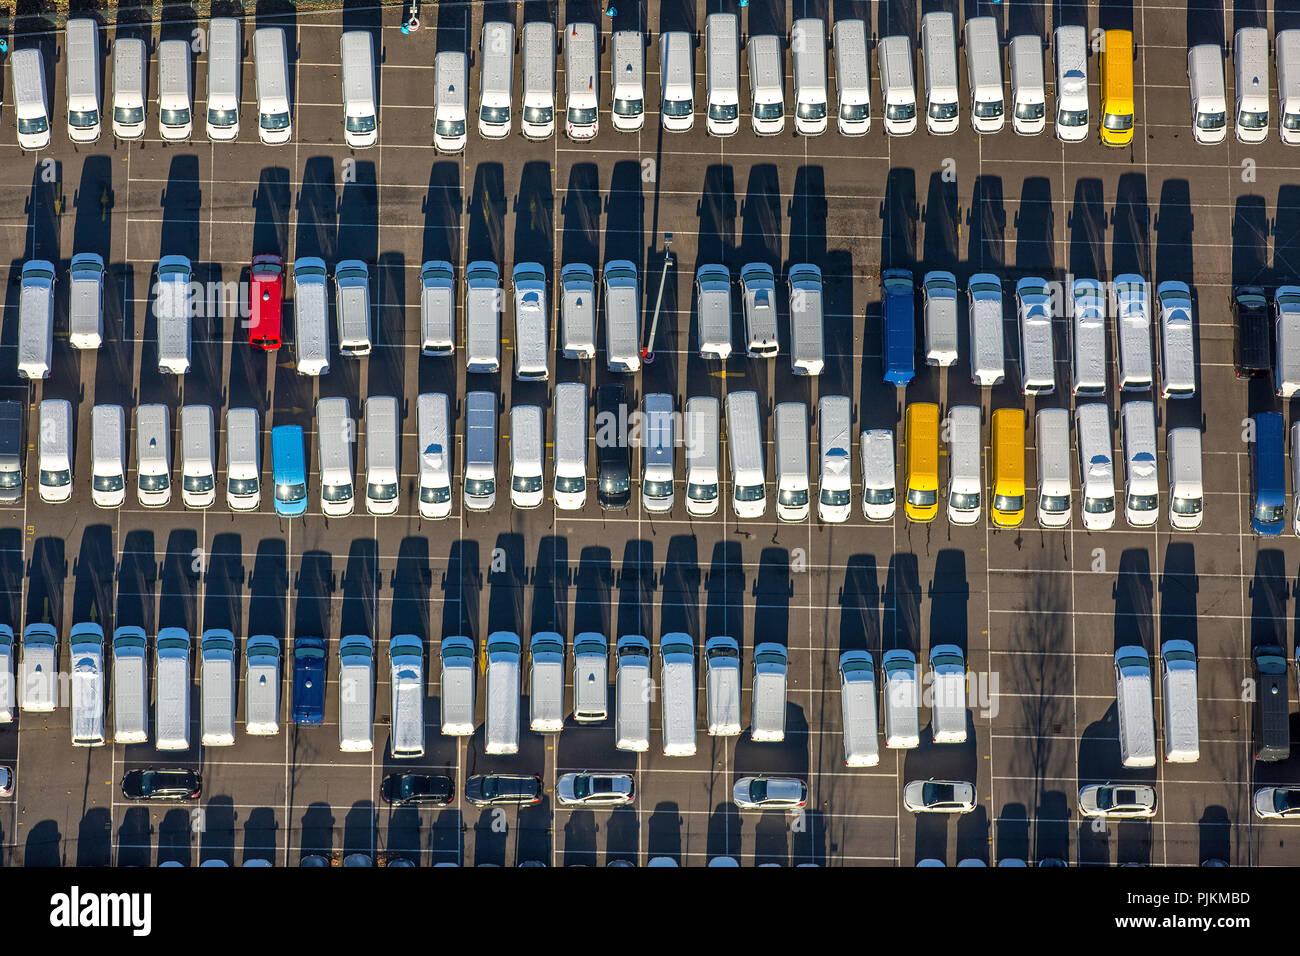 Medienhafen, Nnew car parking lot, Weizenmühlenstraße, Motorhomes, car dump, new car dump, Dusseldorf, Rhineland, North Rhine-Westphalia, Germany - Stock Image